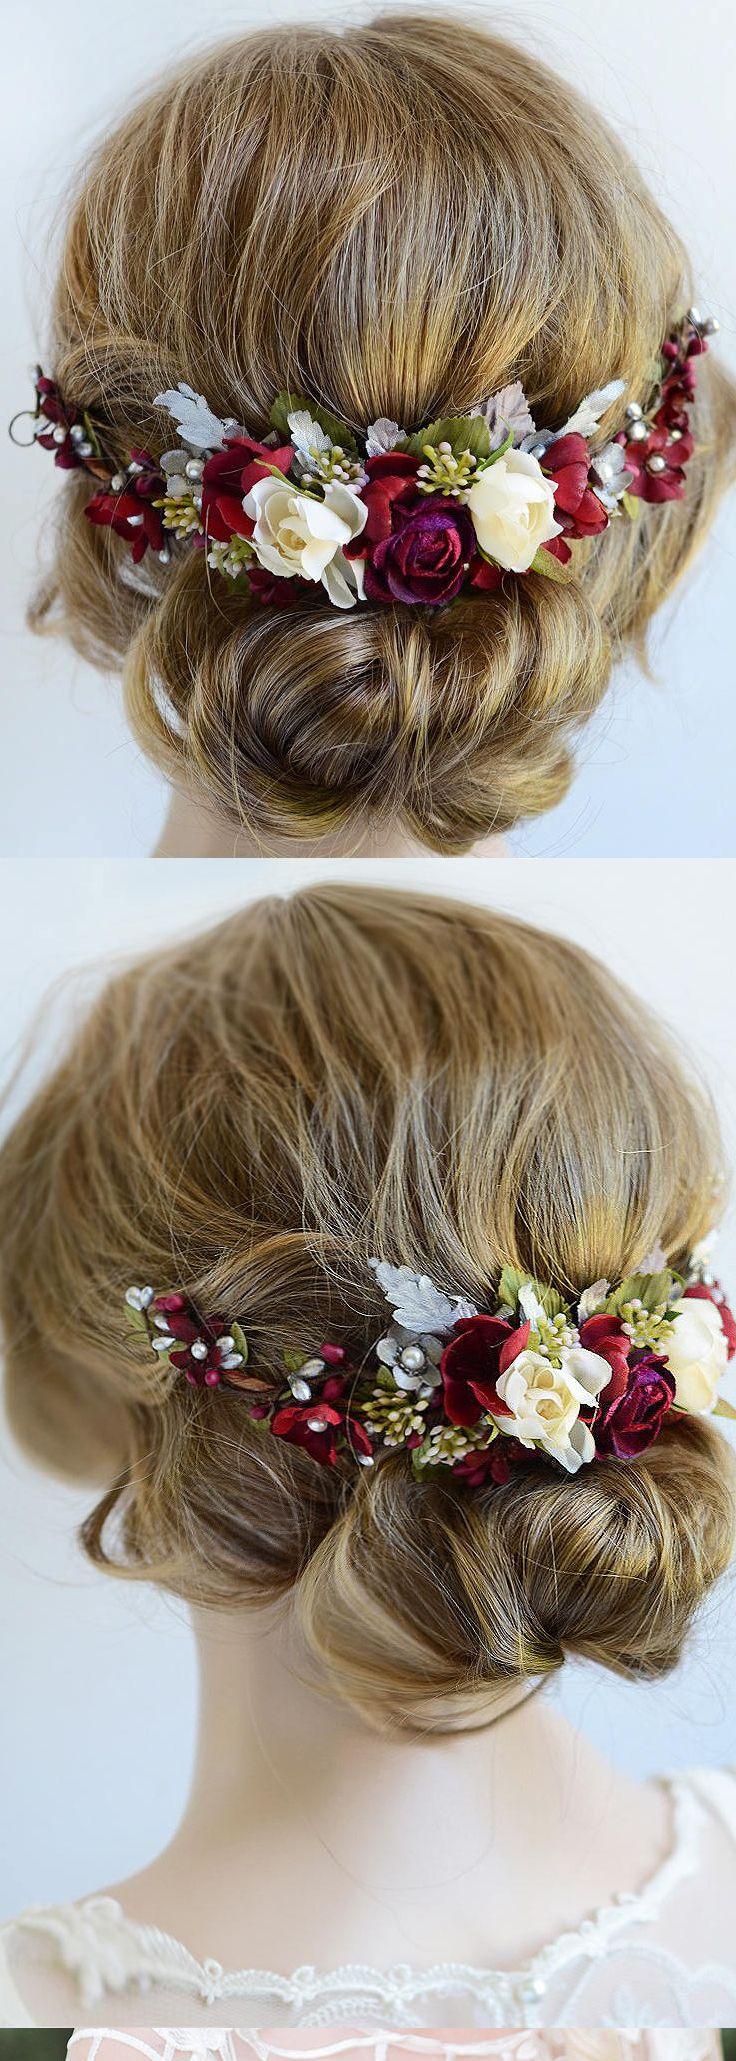 Christmas wedding bridal fascinator floral headpiece in burgundy